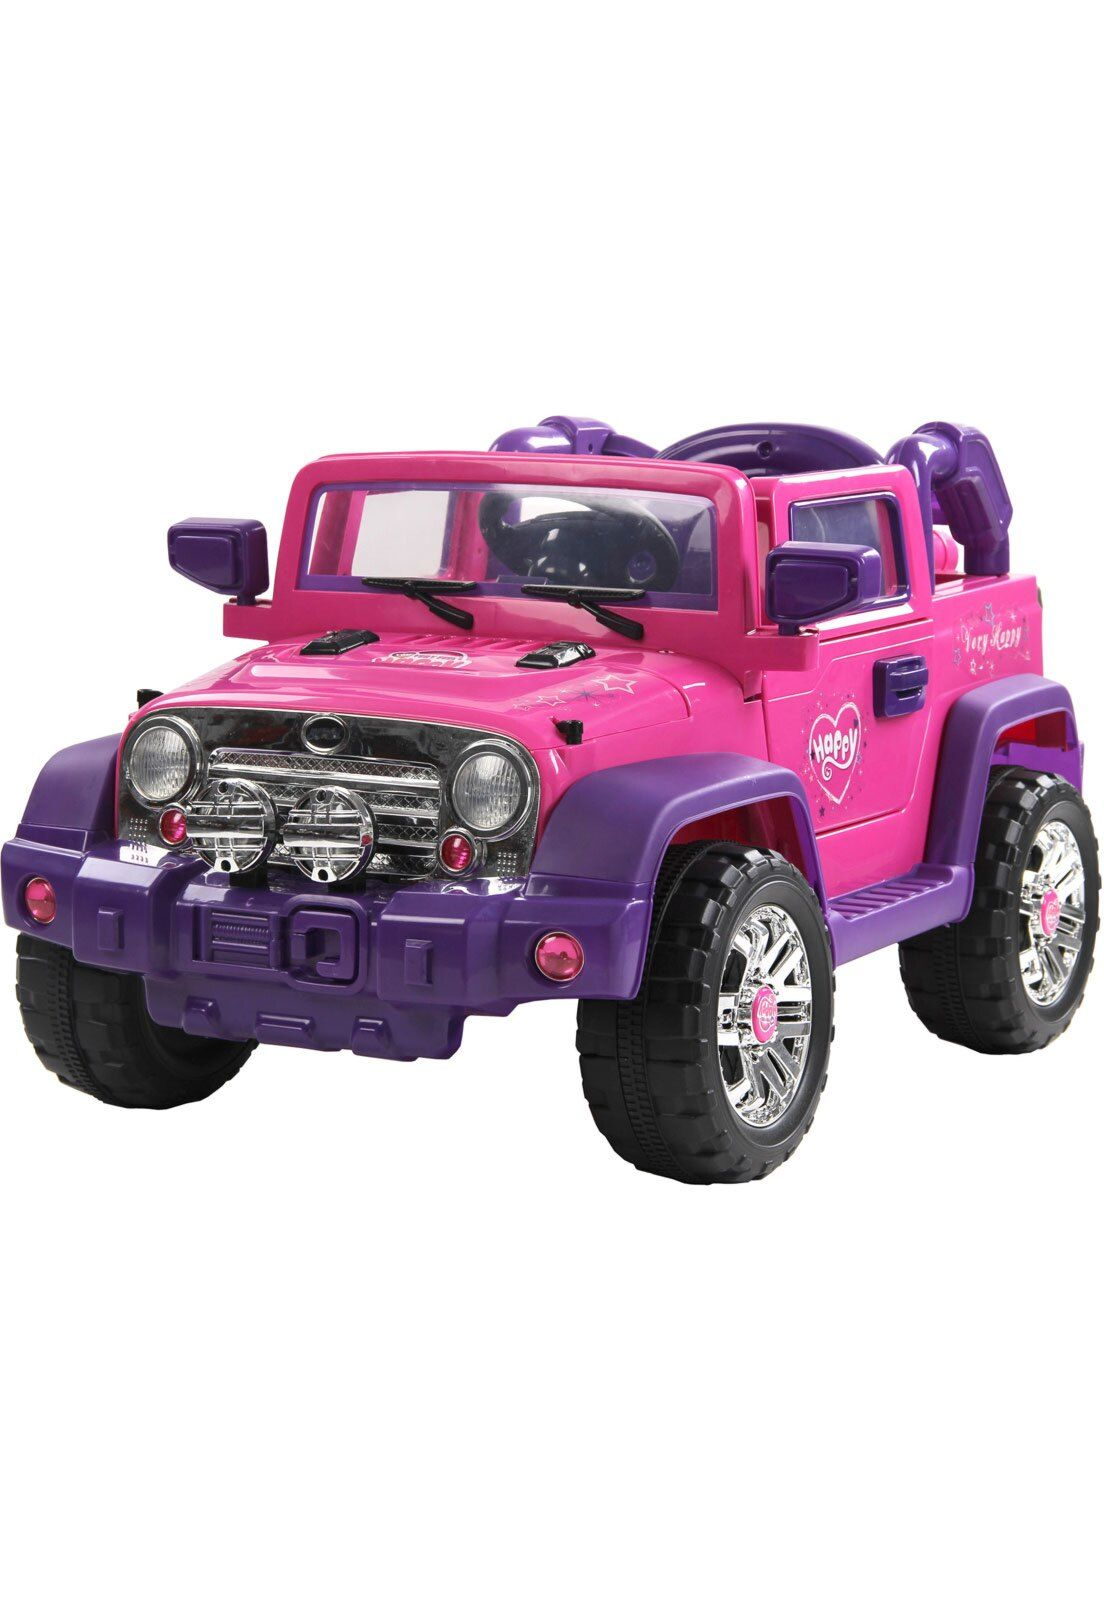 Jipe Eletrico 12v Rali Pink Com Controle Remoto Belfix Jipe Controle Remoto E Carro Eletrico Infantil